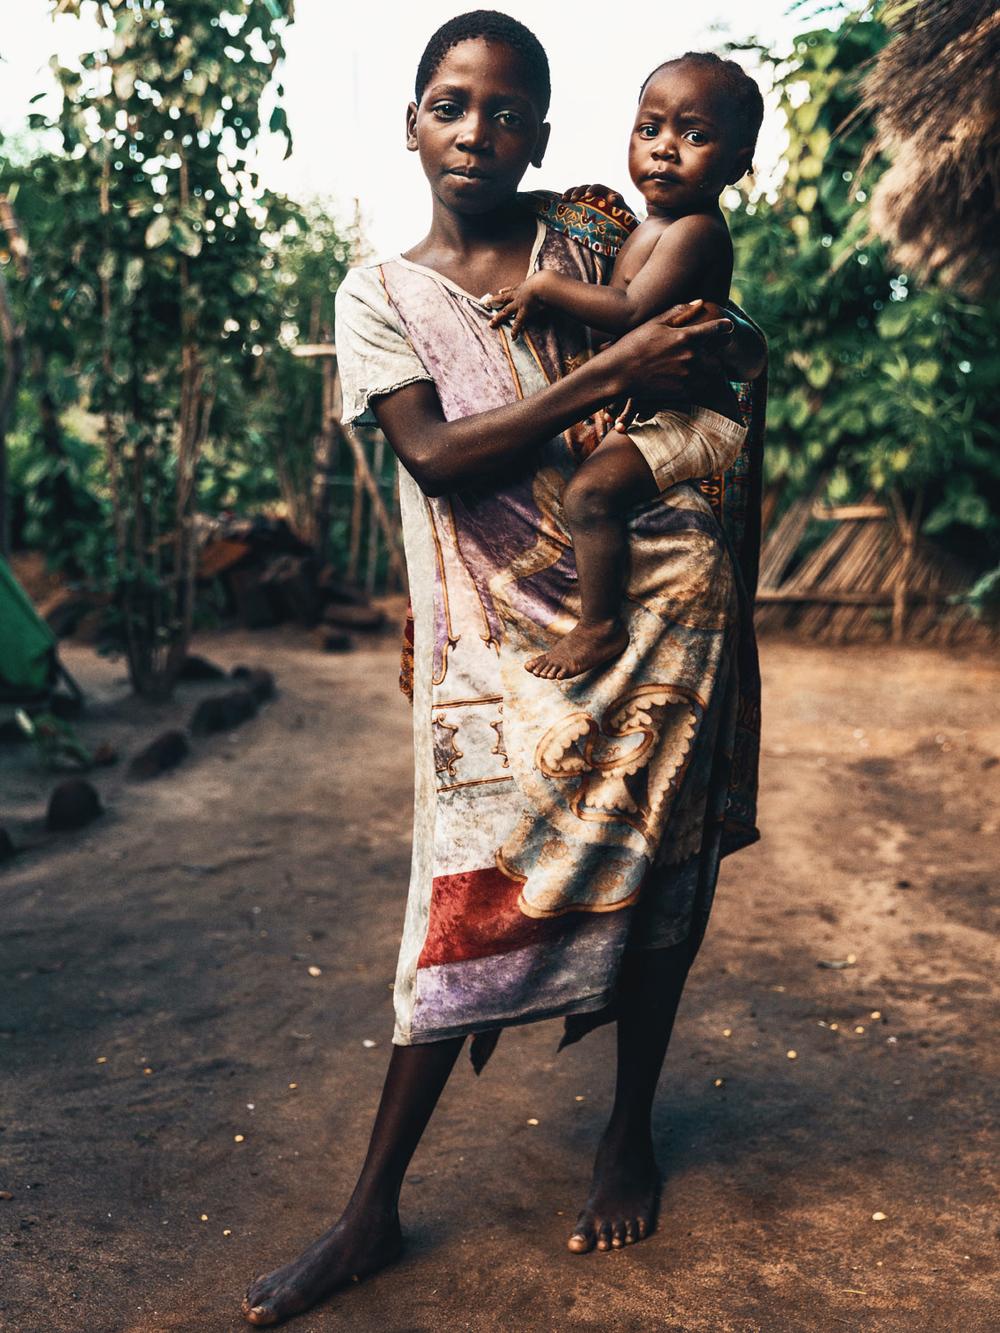 CallieGiovanna_Africa_Malawi_Chitimba_20150101_06324.jpg